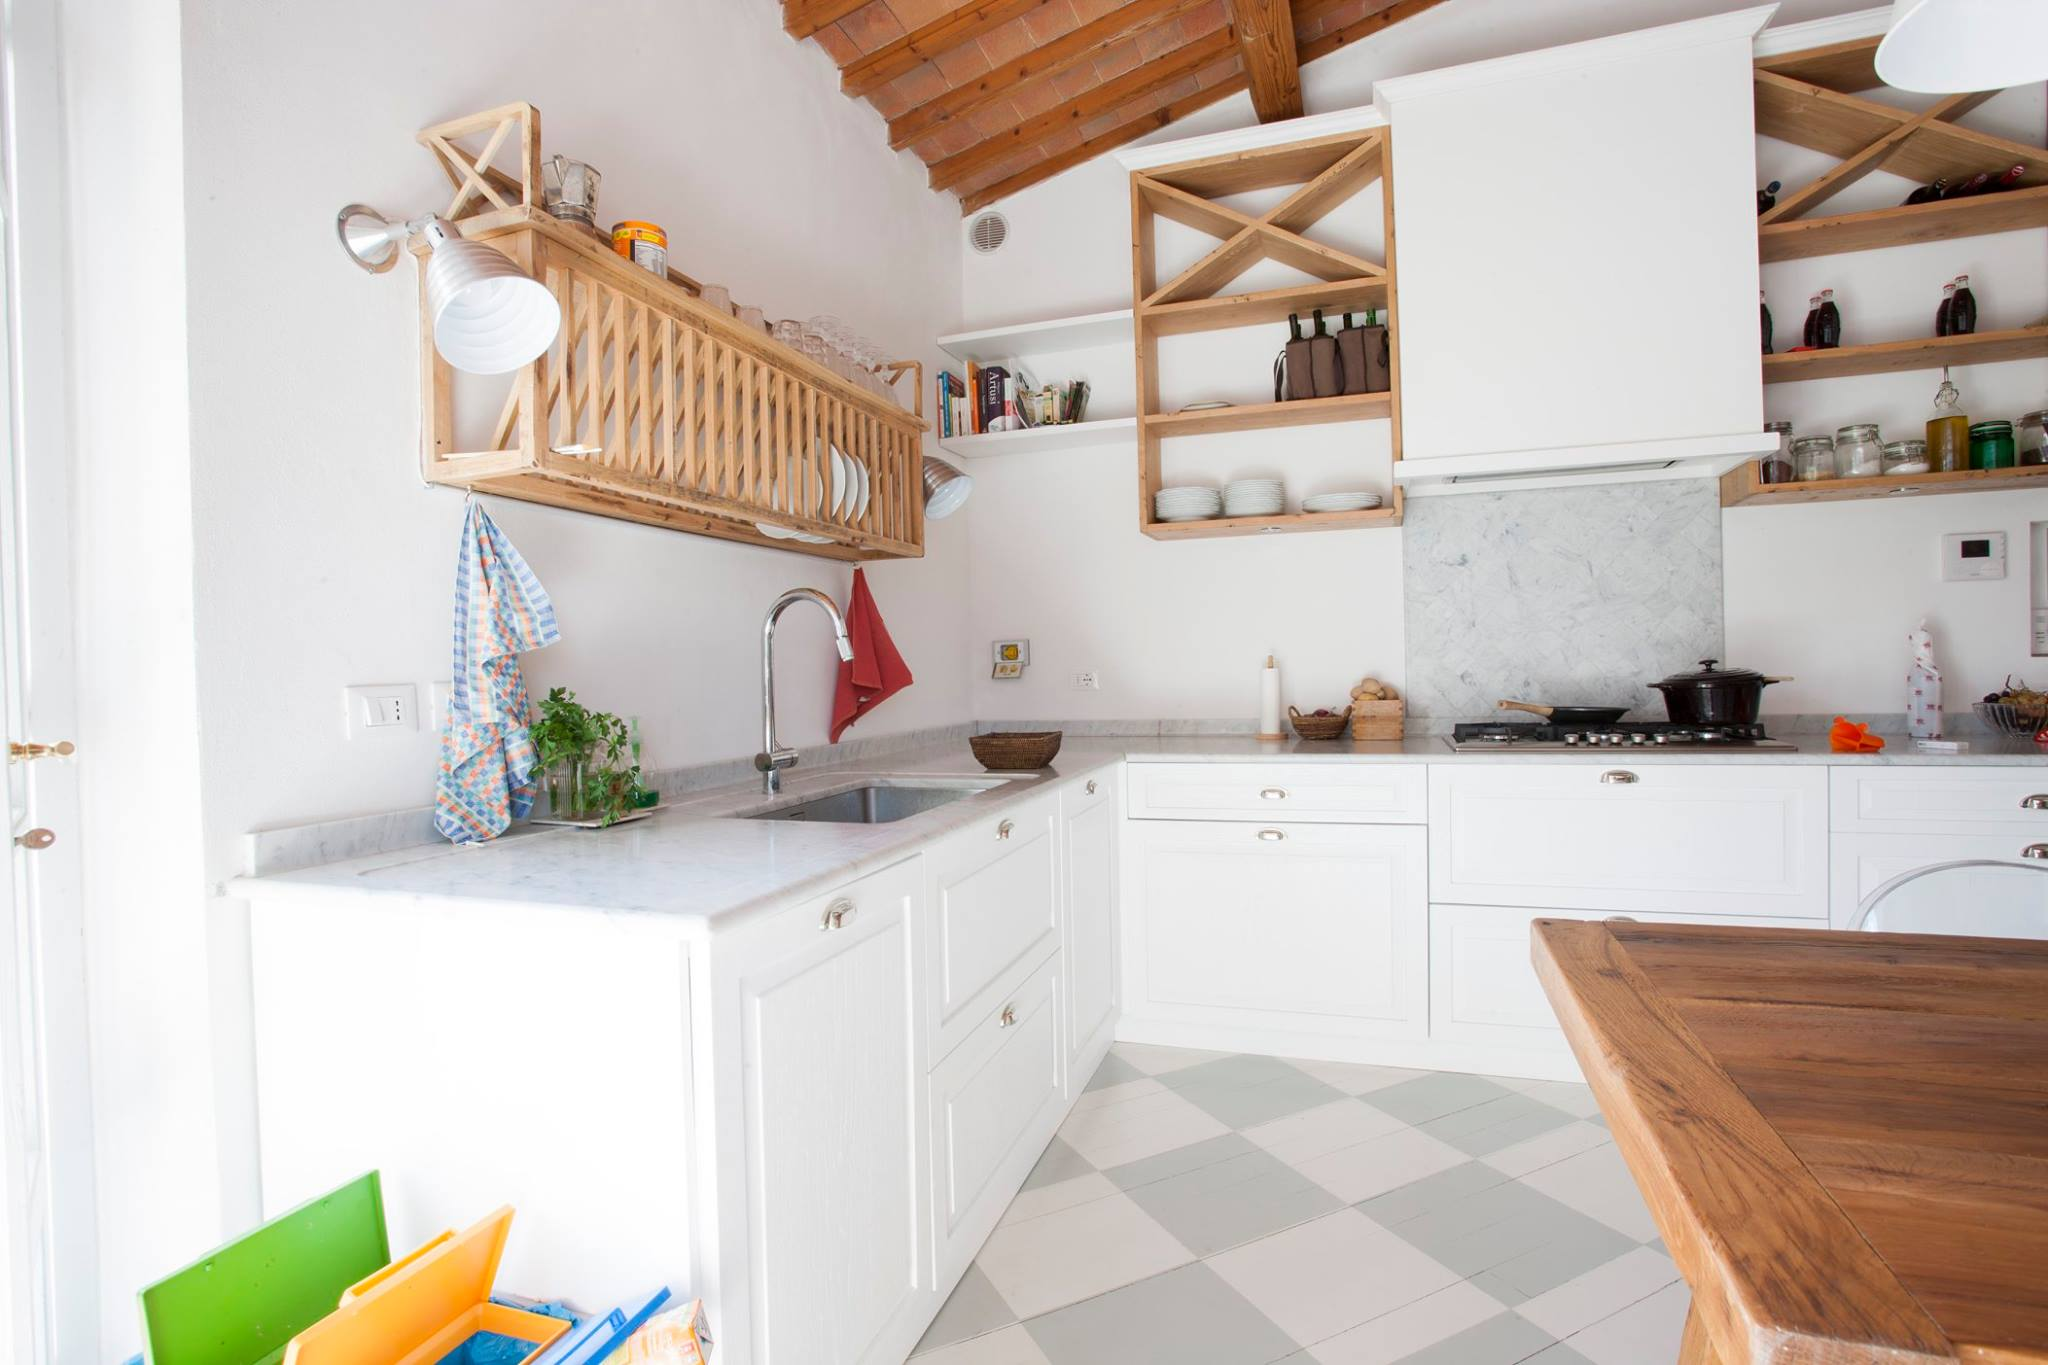 Cucine su misura|cucine in legno|arredamentiroma